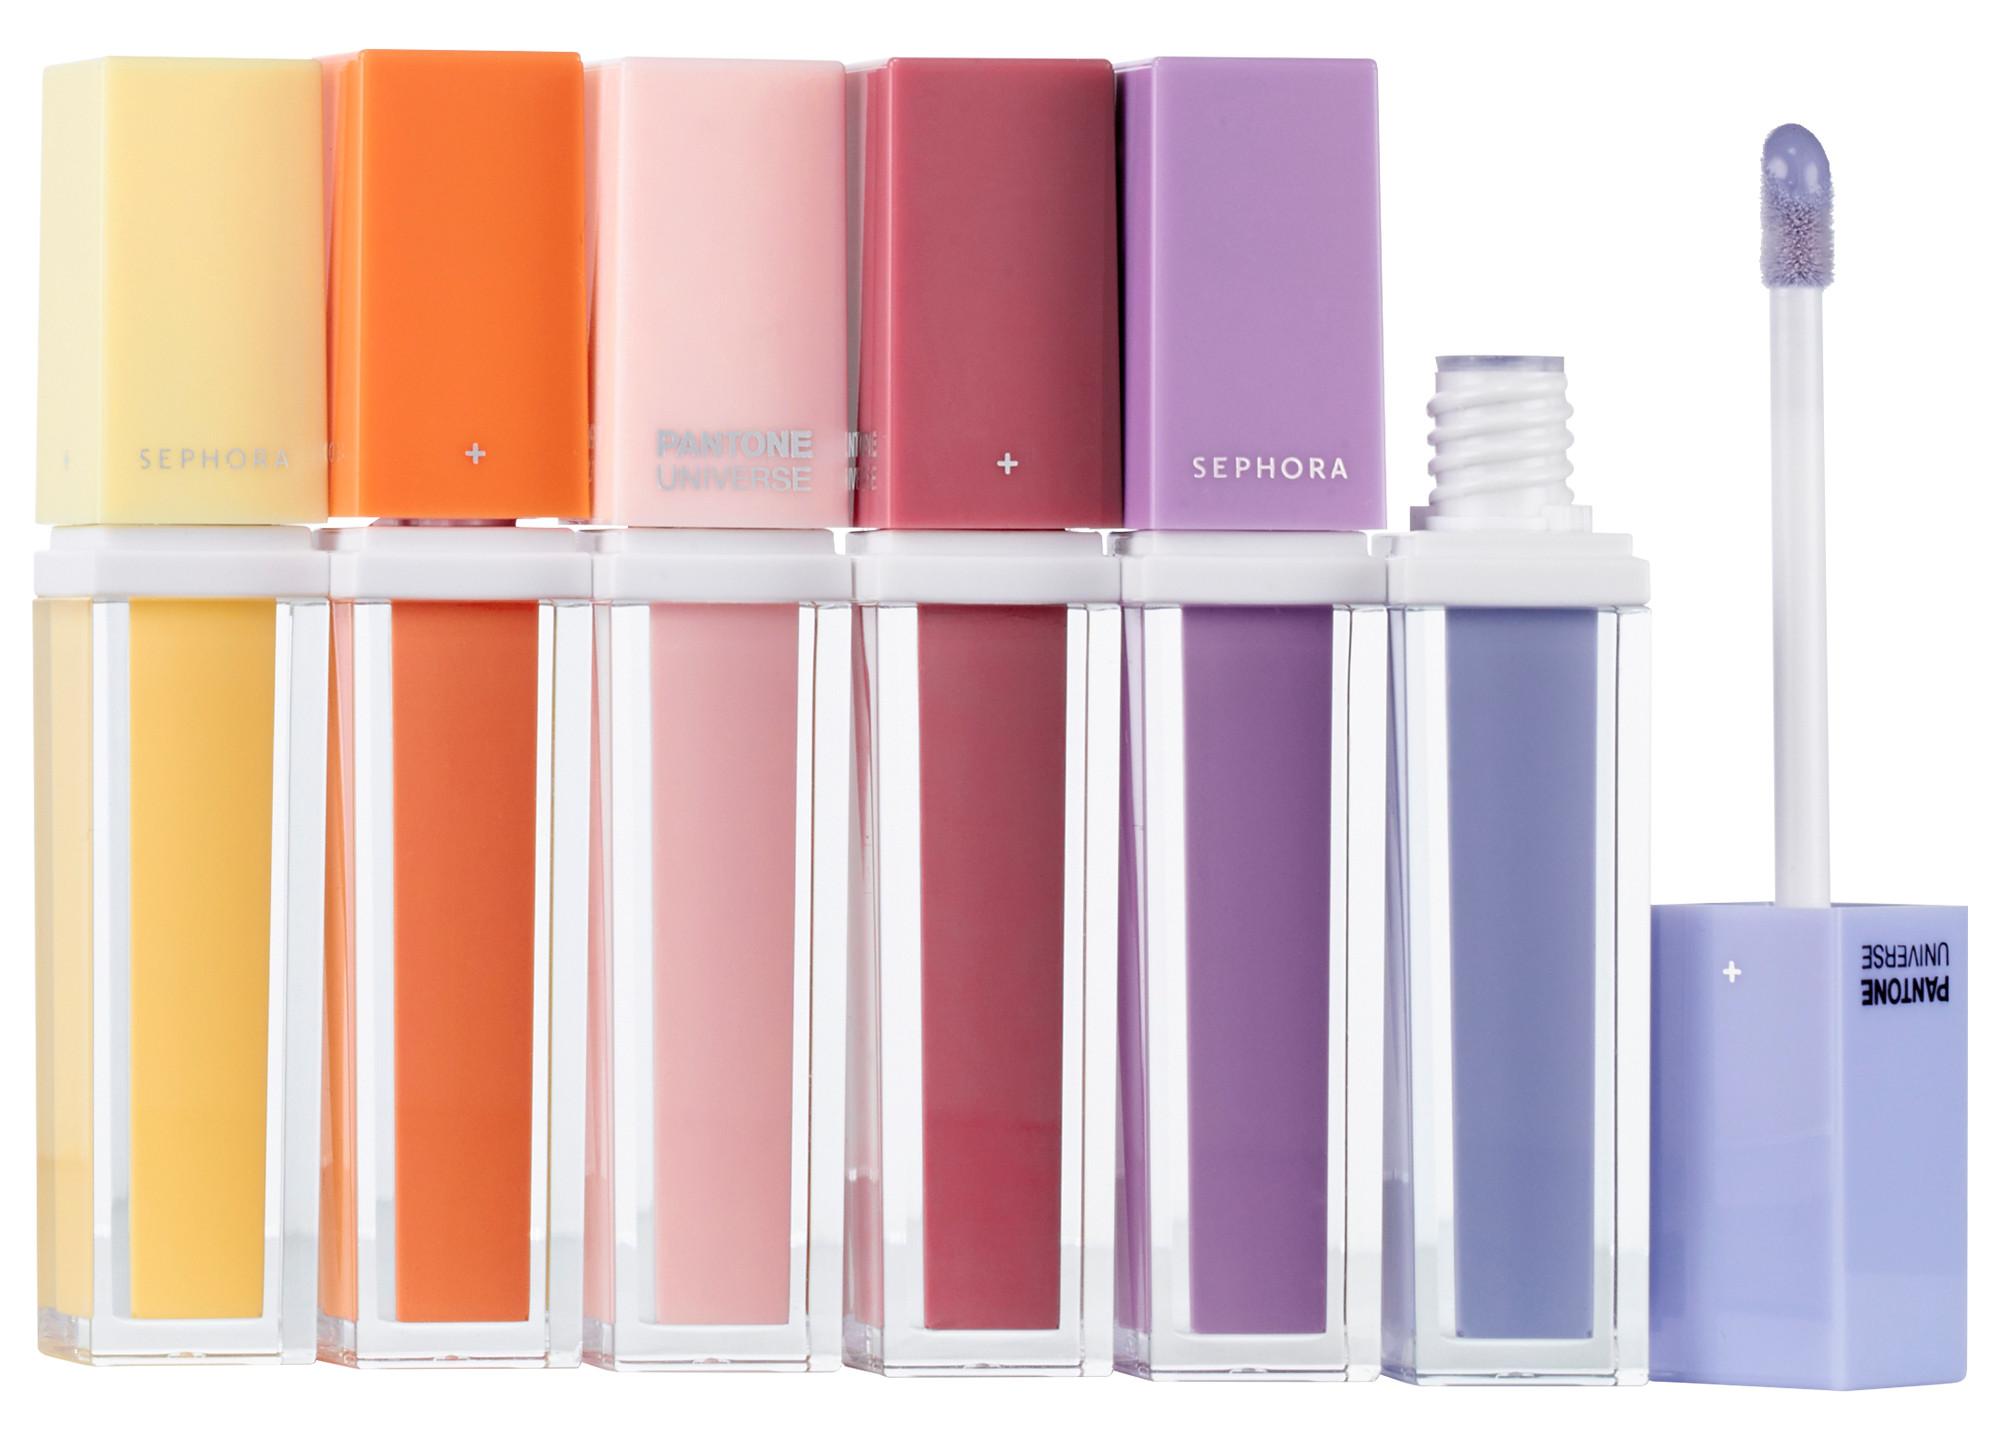 Sephora Lip Gloss Pantone Colors